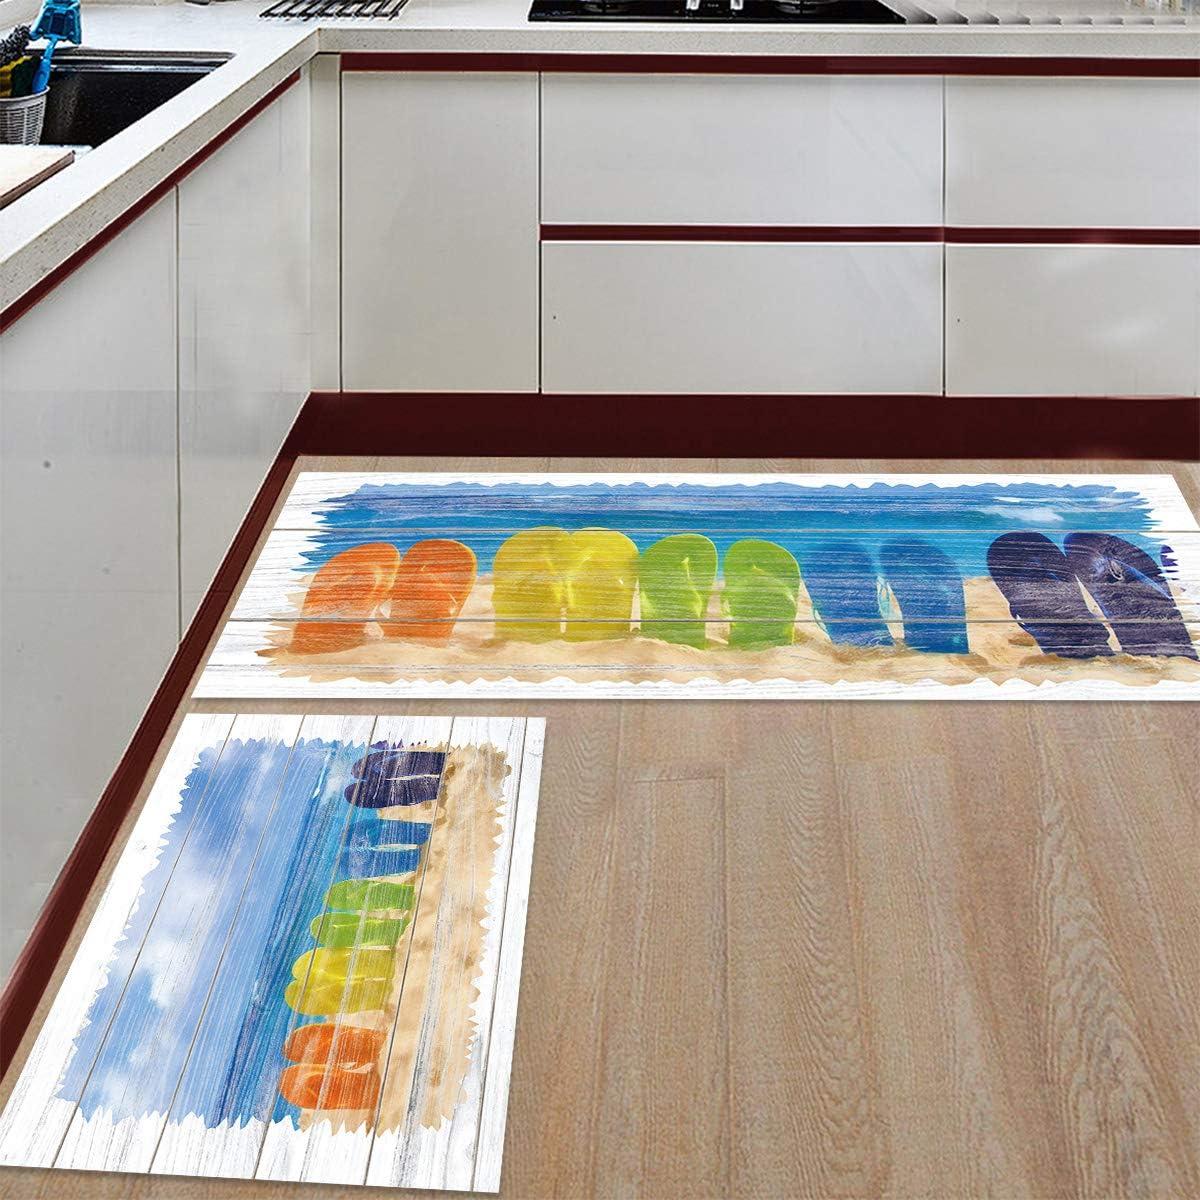 Advancey 2 Pieces Anti-Slip Kitchen Dedication Flip Mats Max 44% OFF Flops wit Colroful